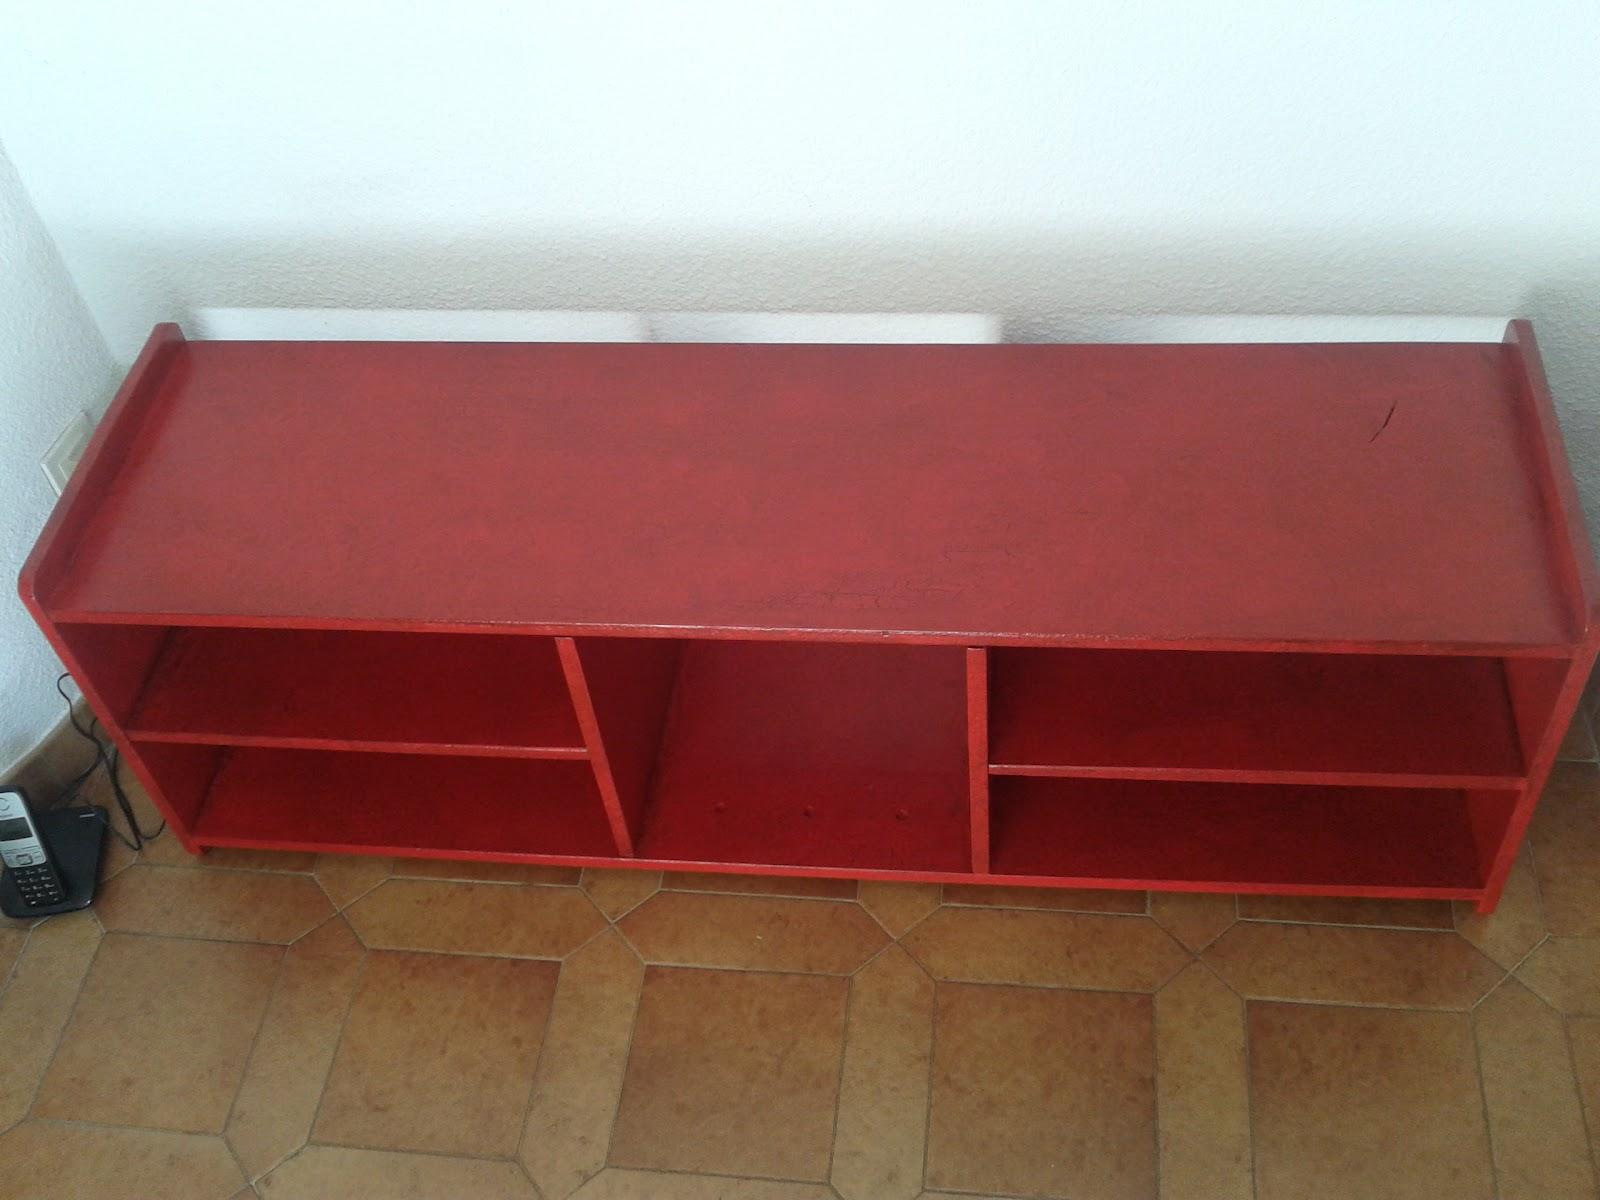 meubles et objets peints l 39 empreinte des patineuses. Black Bedroom Furniture Sets. Home Design Ideas